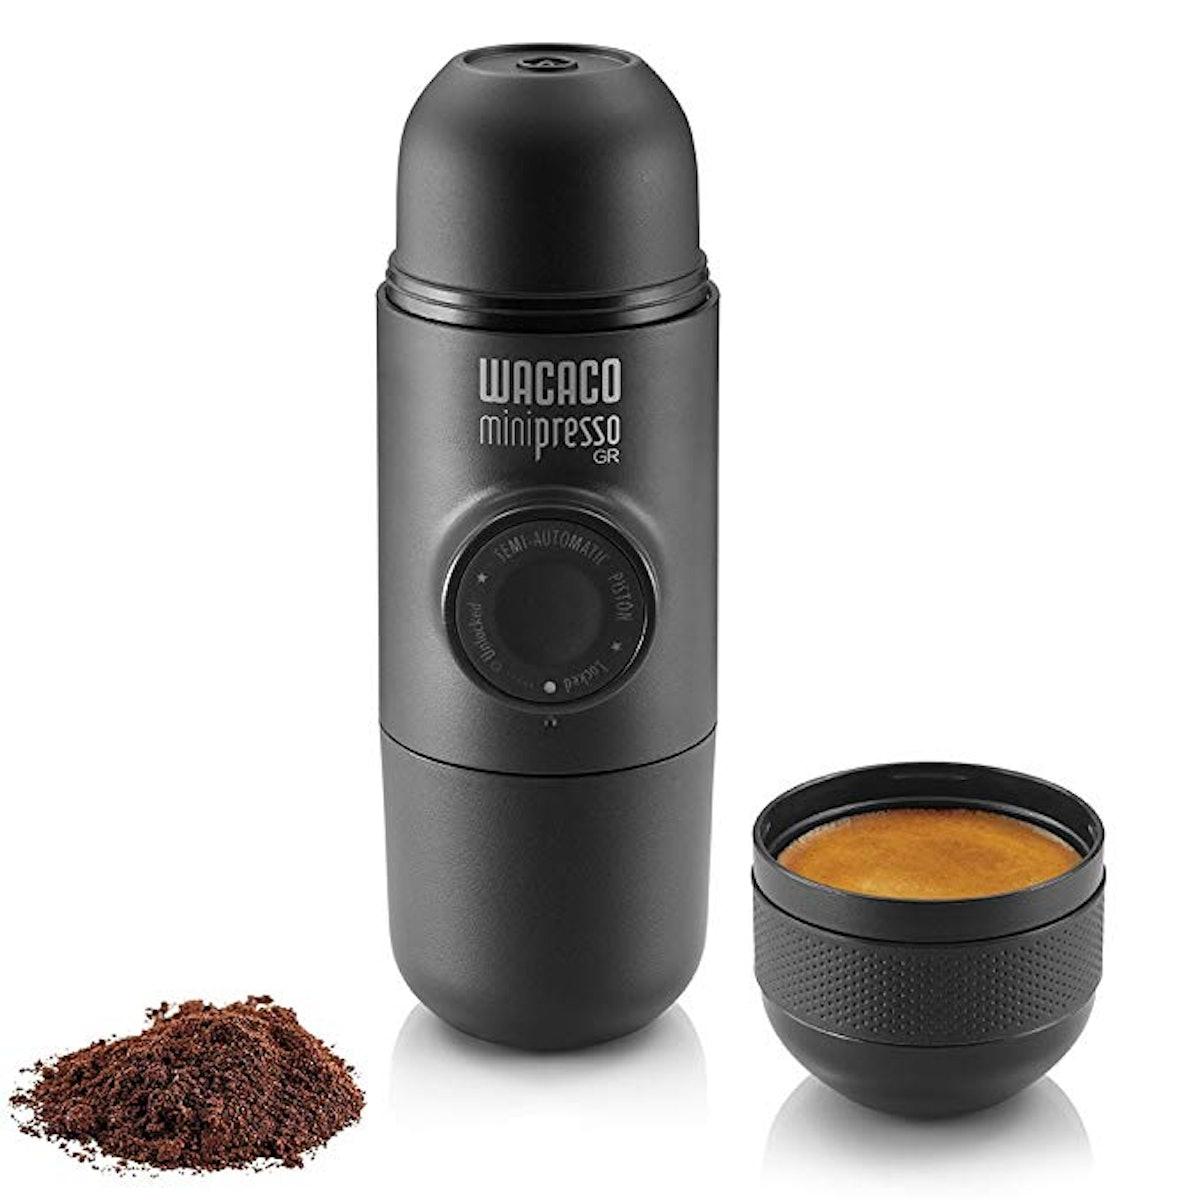 Wacaco Minipresso Machine